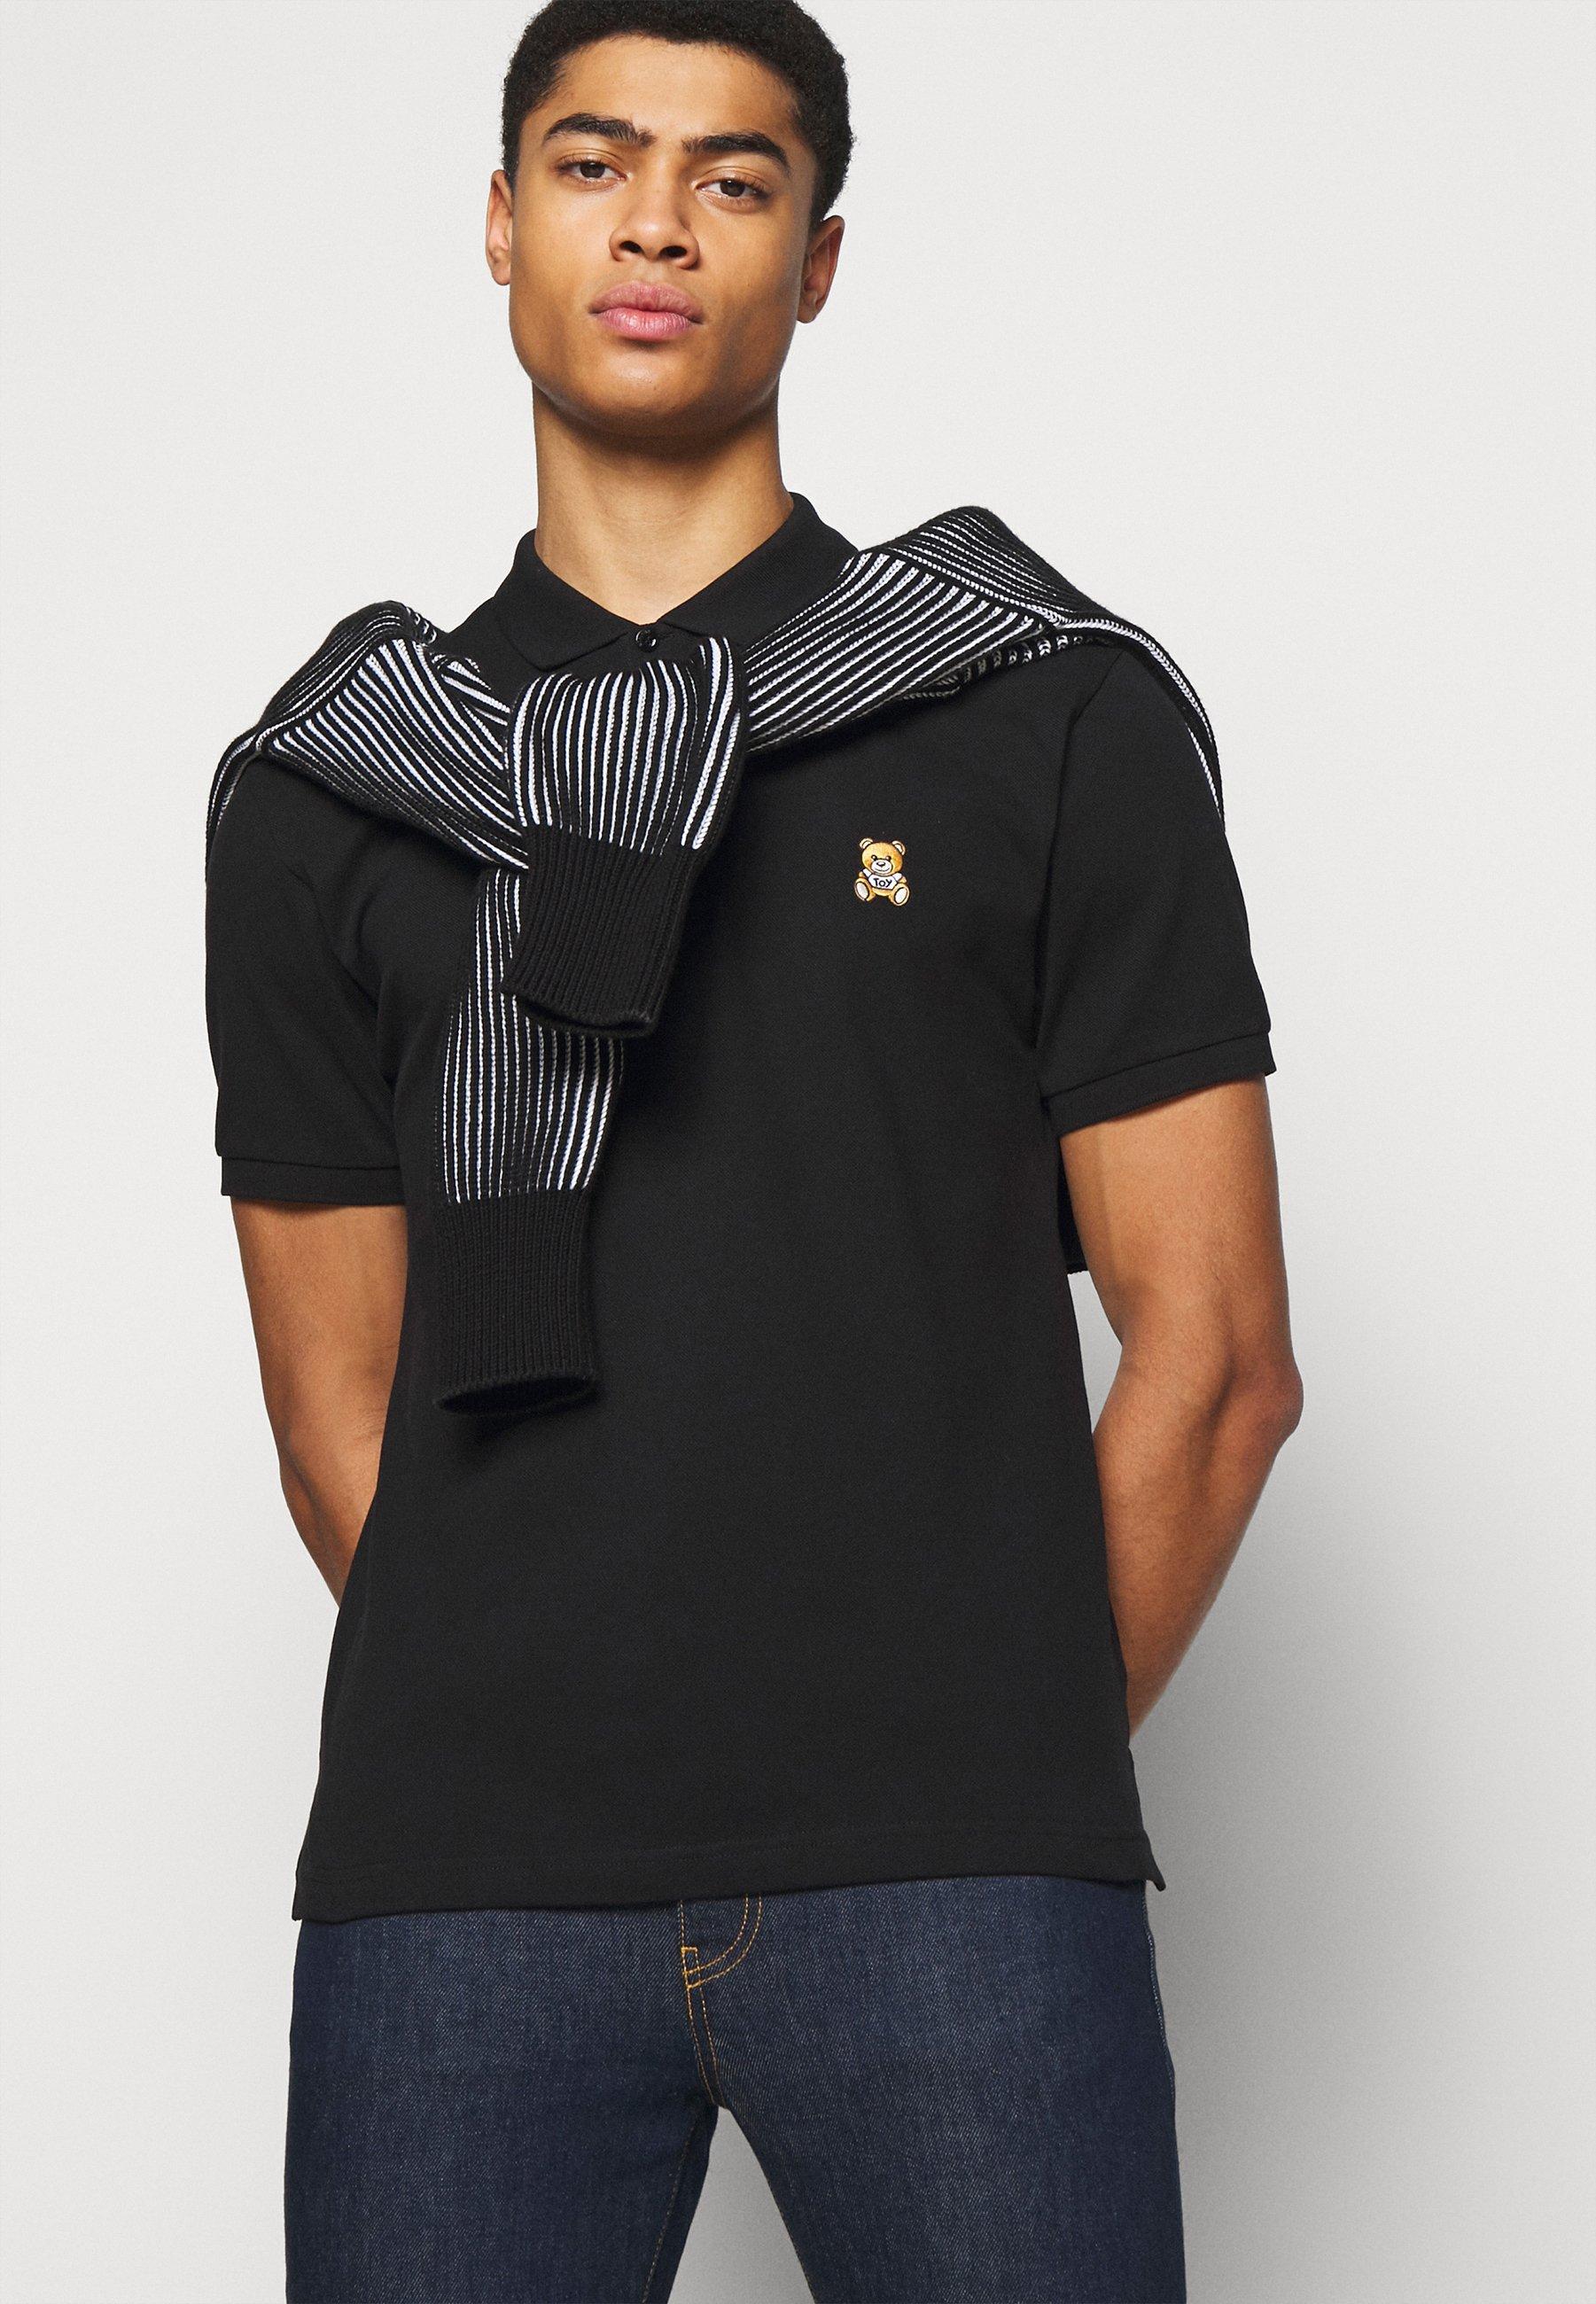 Men UPPER BODY GARMENT - Polo shirt